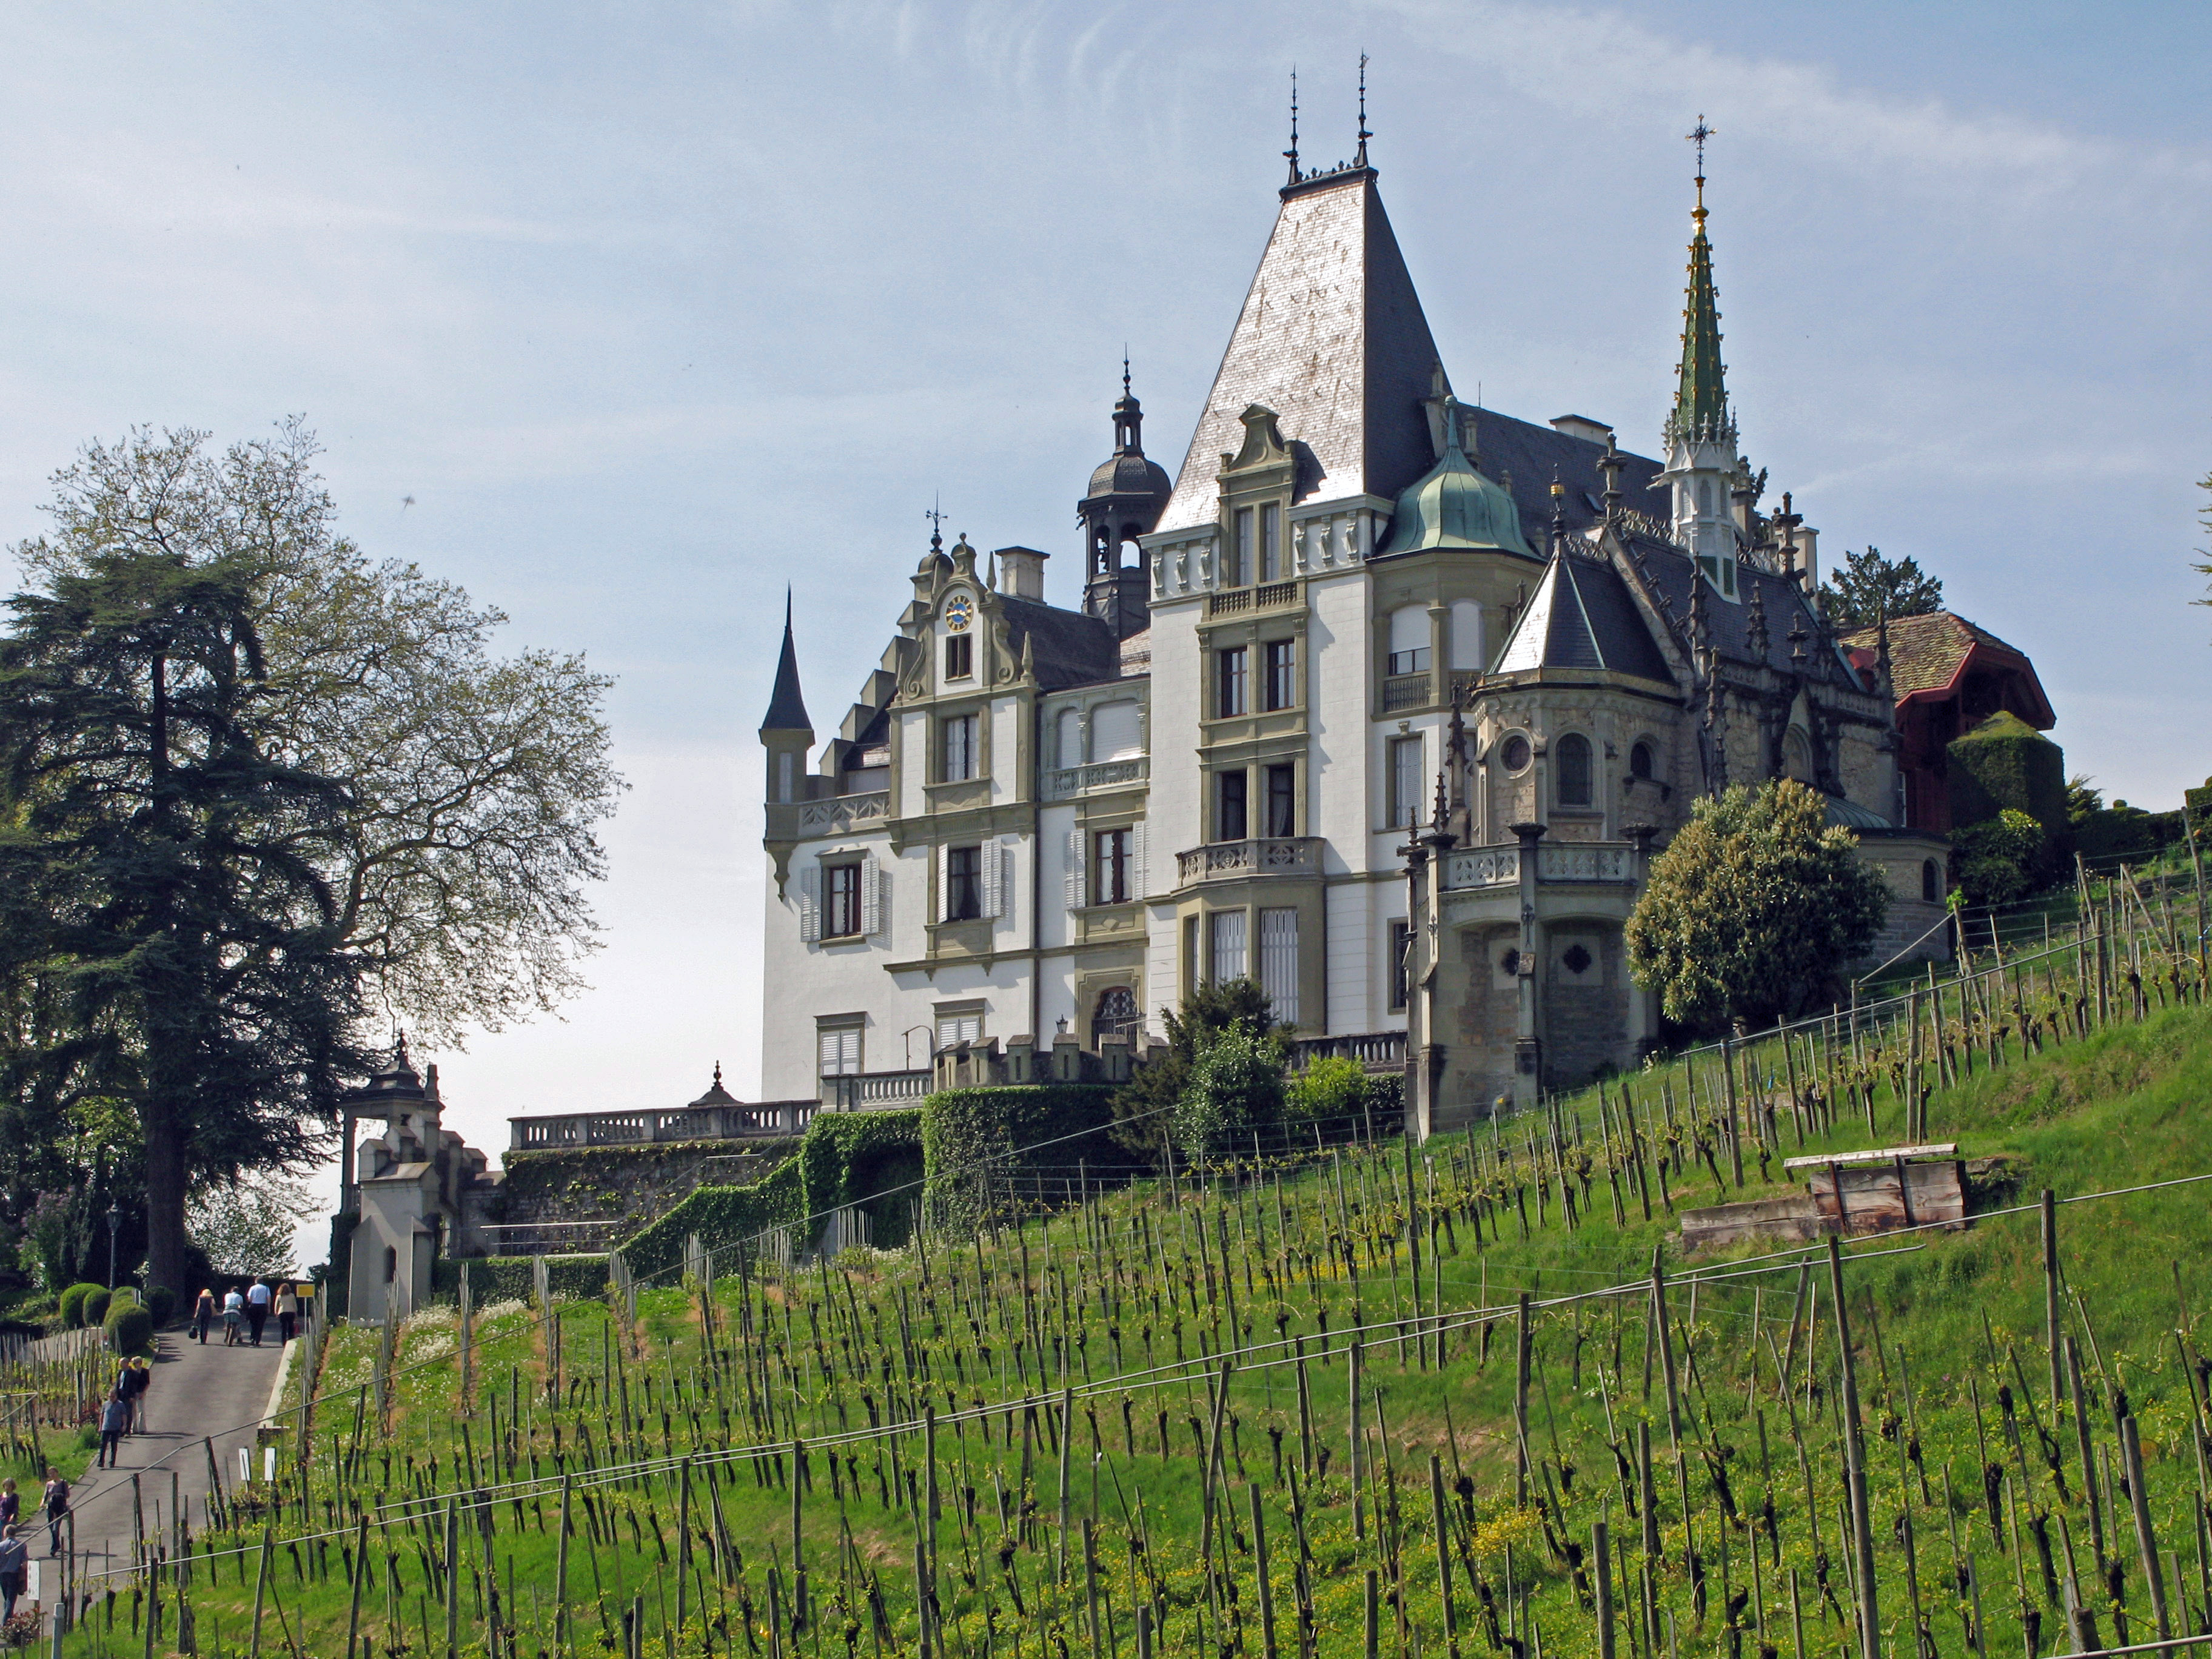 Schloss_Meggenhorn_Meggen_Vierwaldstaettersee